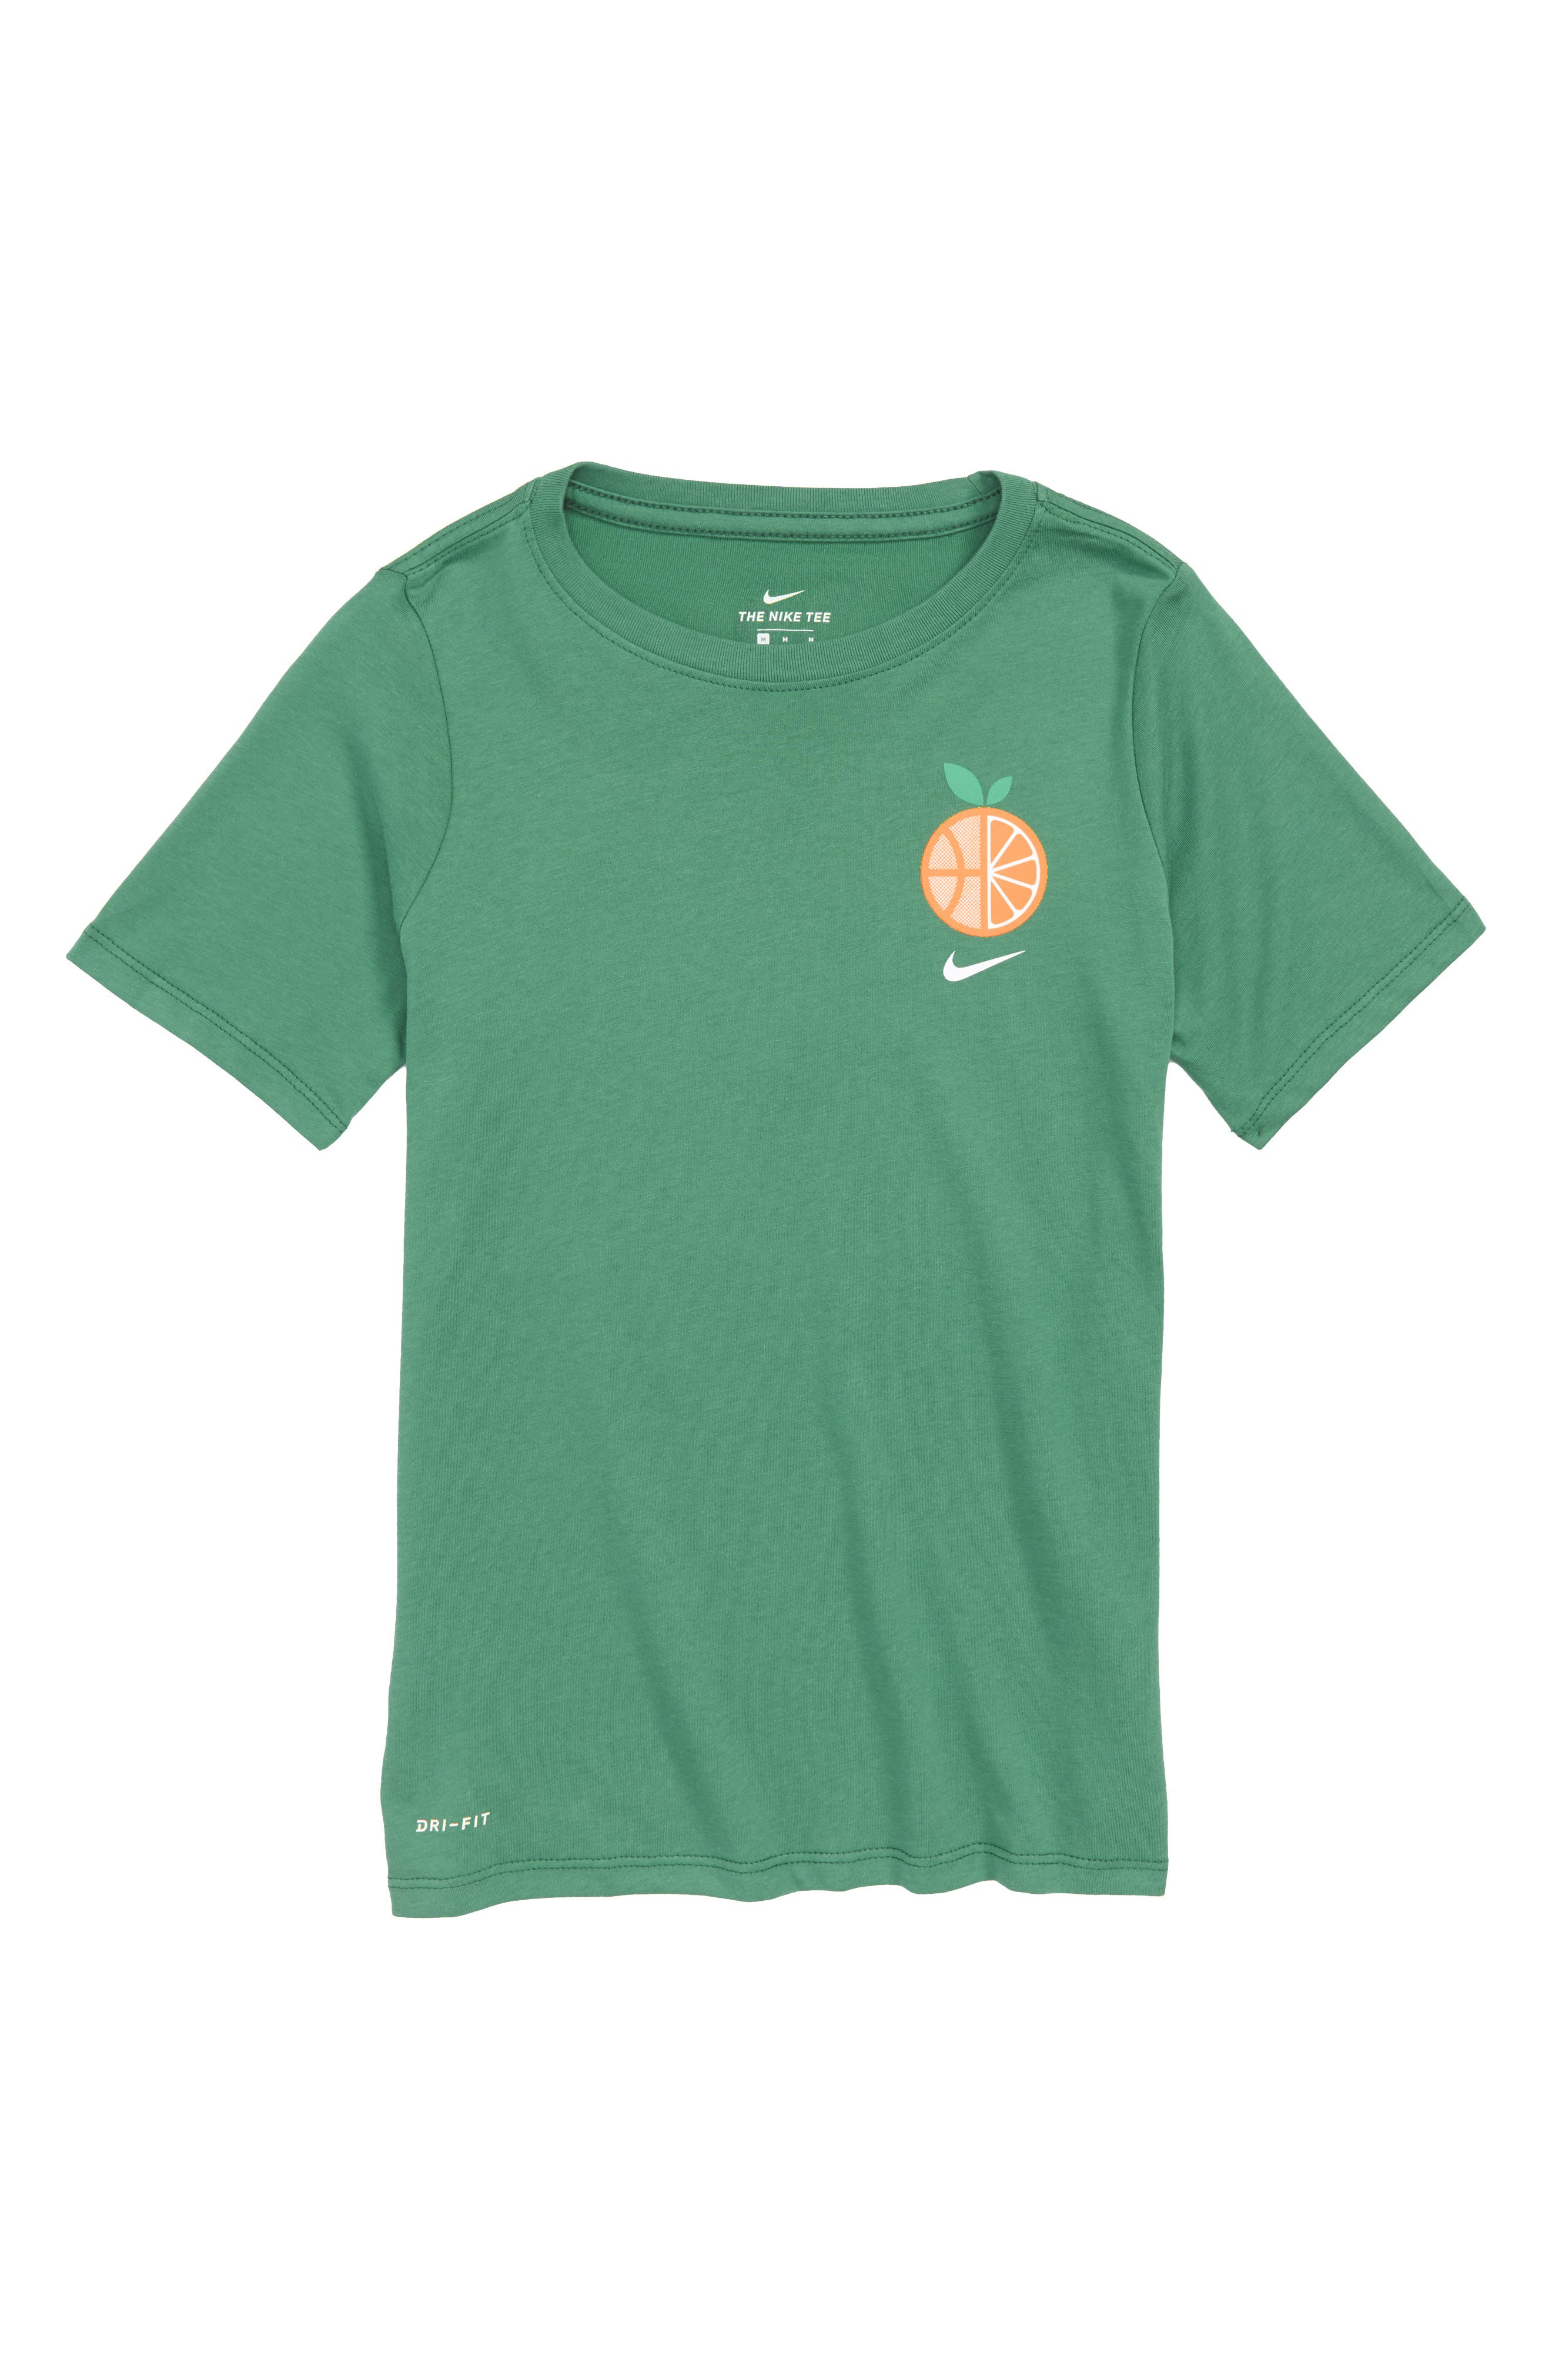 Nike Dry Game So Fresh Graphic T-Shirt (Little Boys & Big Boys)